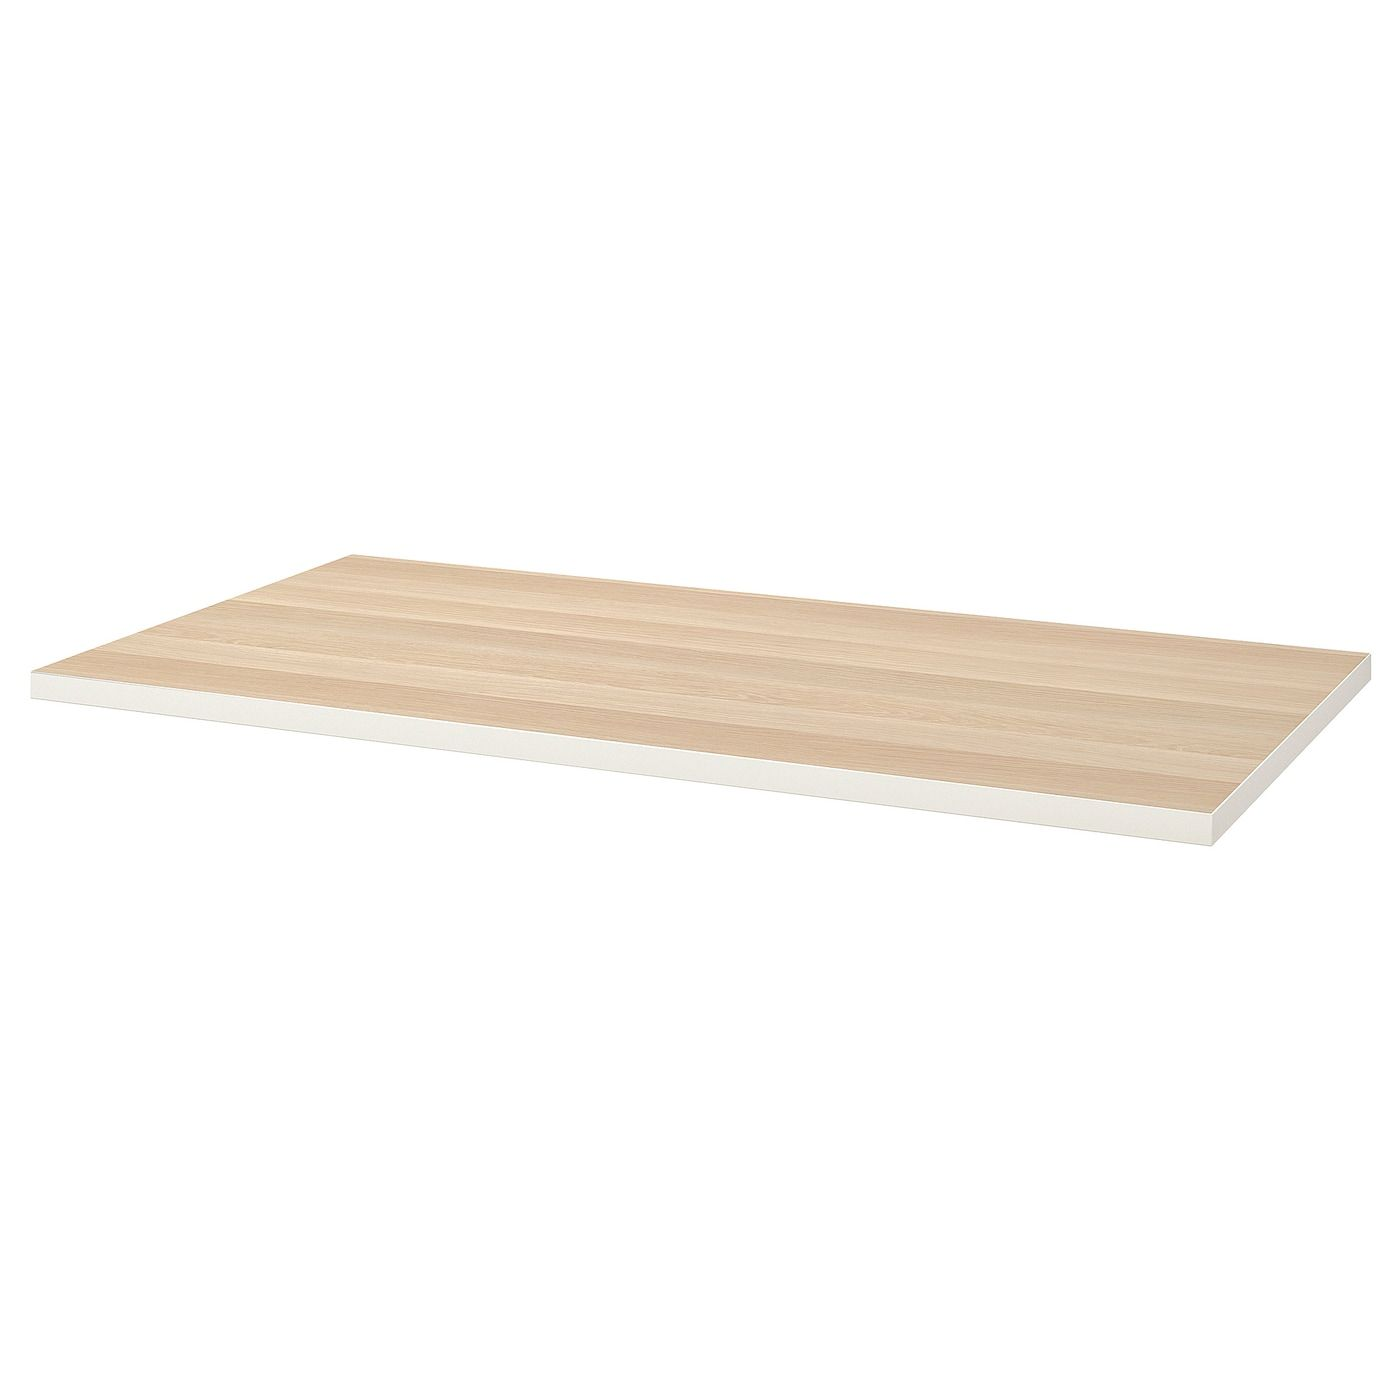 Linnmon Tafelblad Wit Wit Gelazuurd Eikeneffect 150x75 Cm Ikea Ikea Linnmon Table Top White Stain